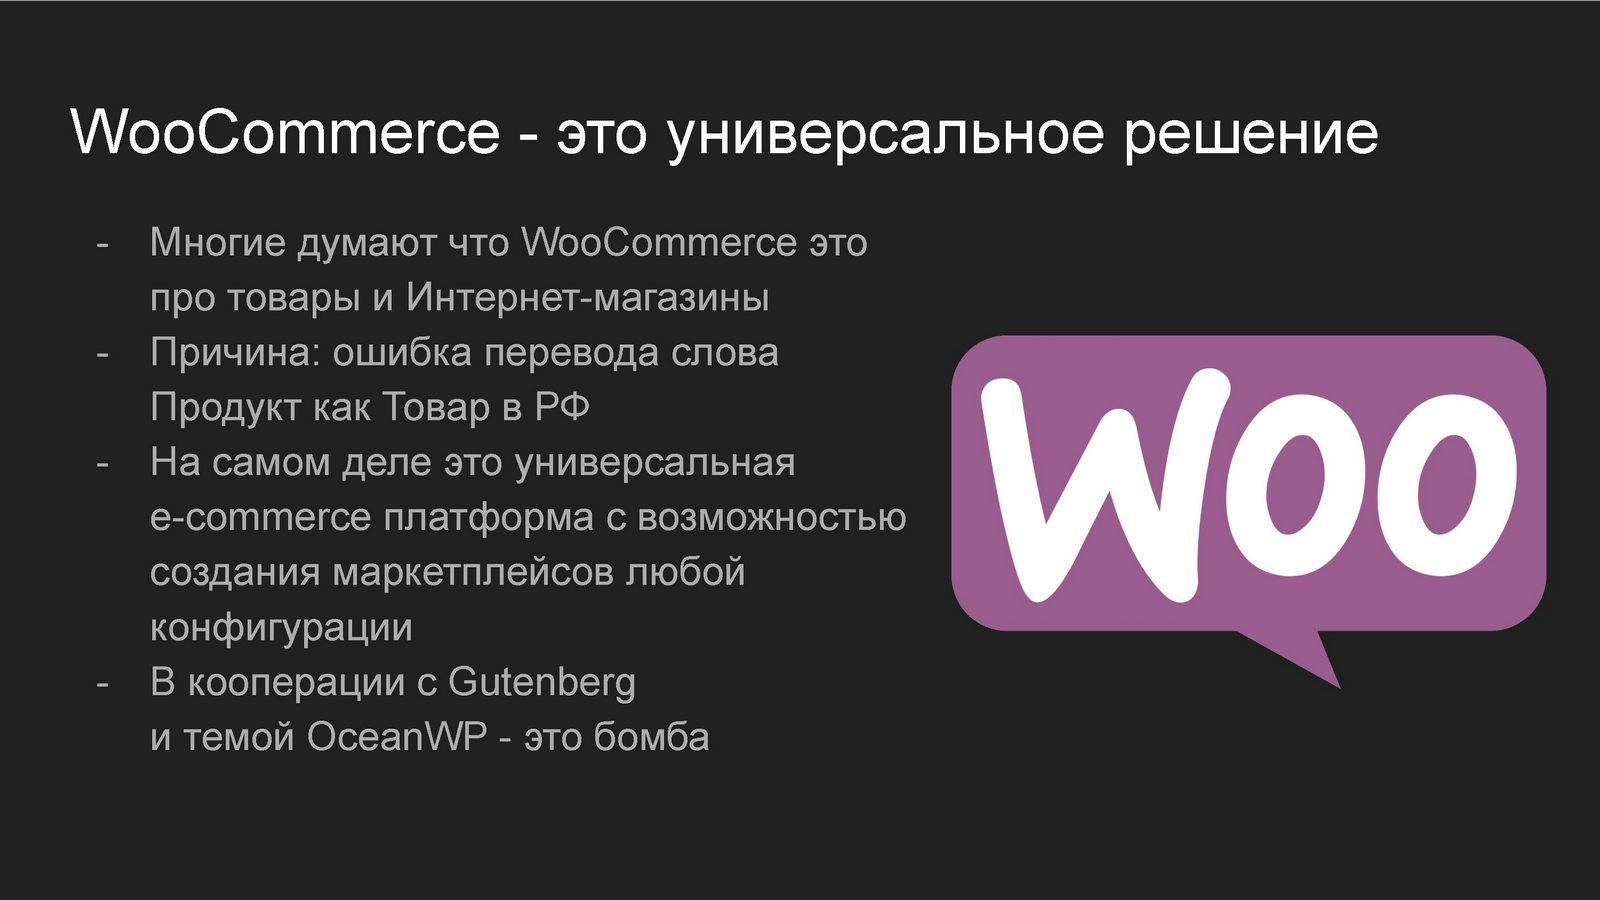 wp10-Анатолий Юмашев-Агрегатор bizzapps.ru 05